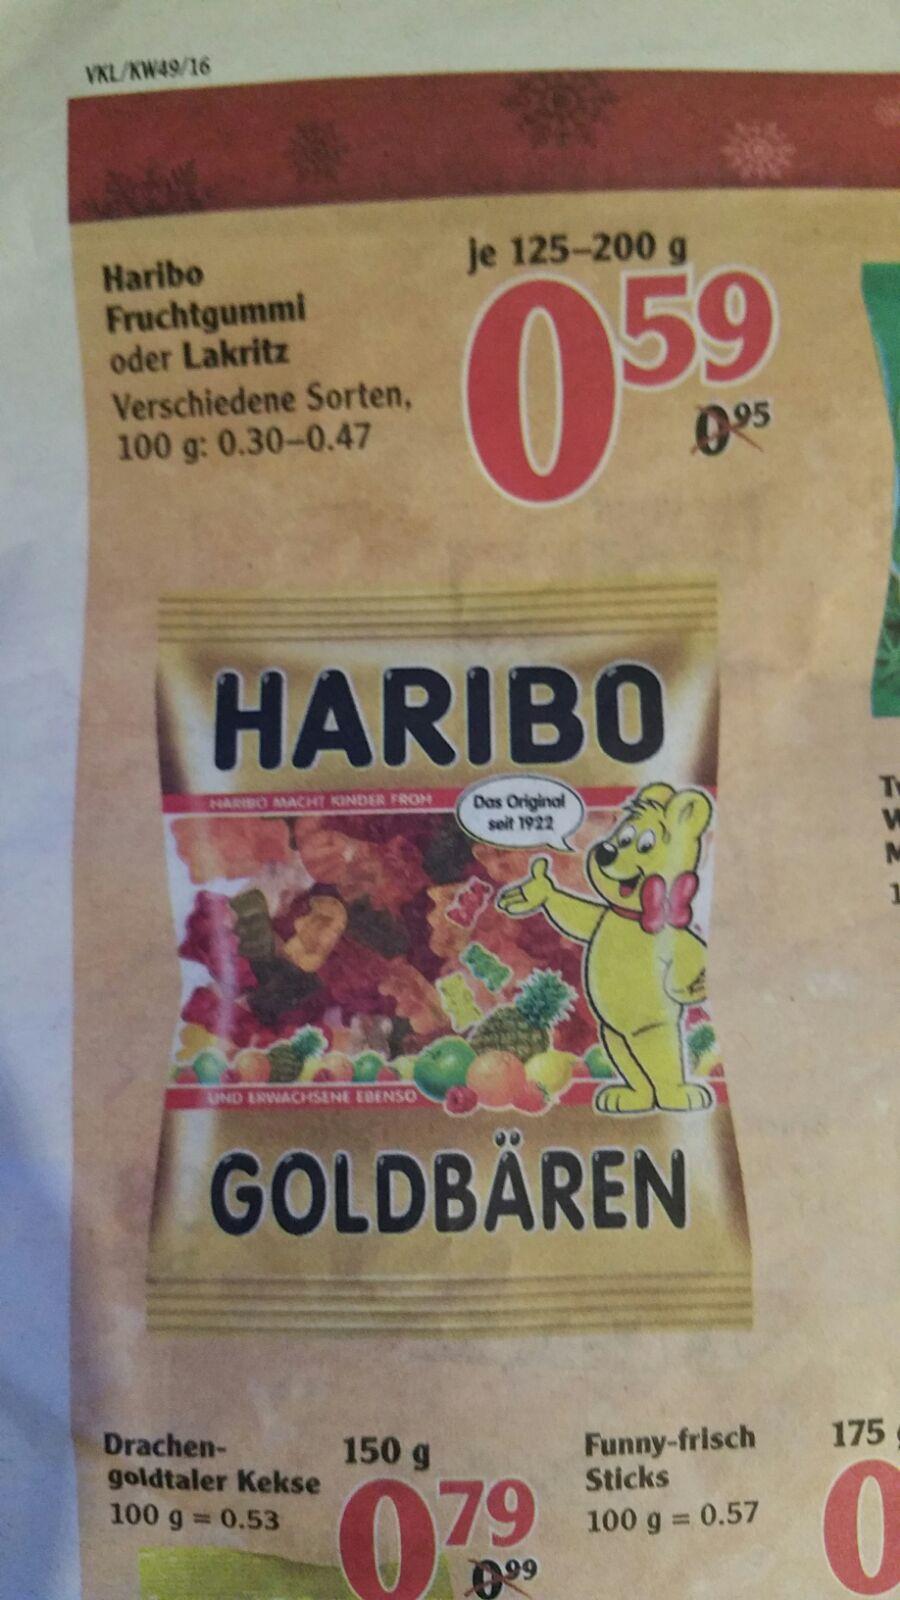 [ Local ] Globus Völklingen - Haribo 125-200 g für 0,59 Euro